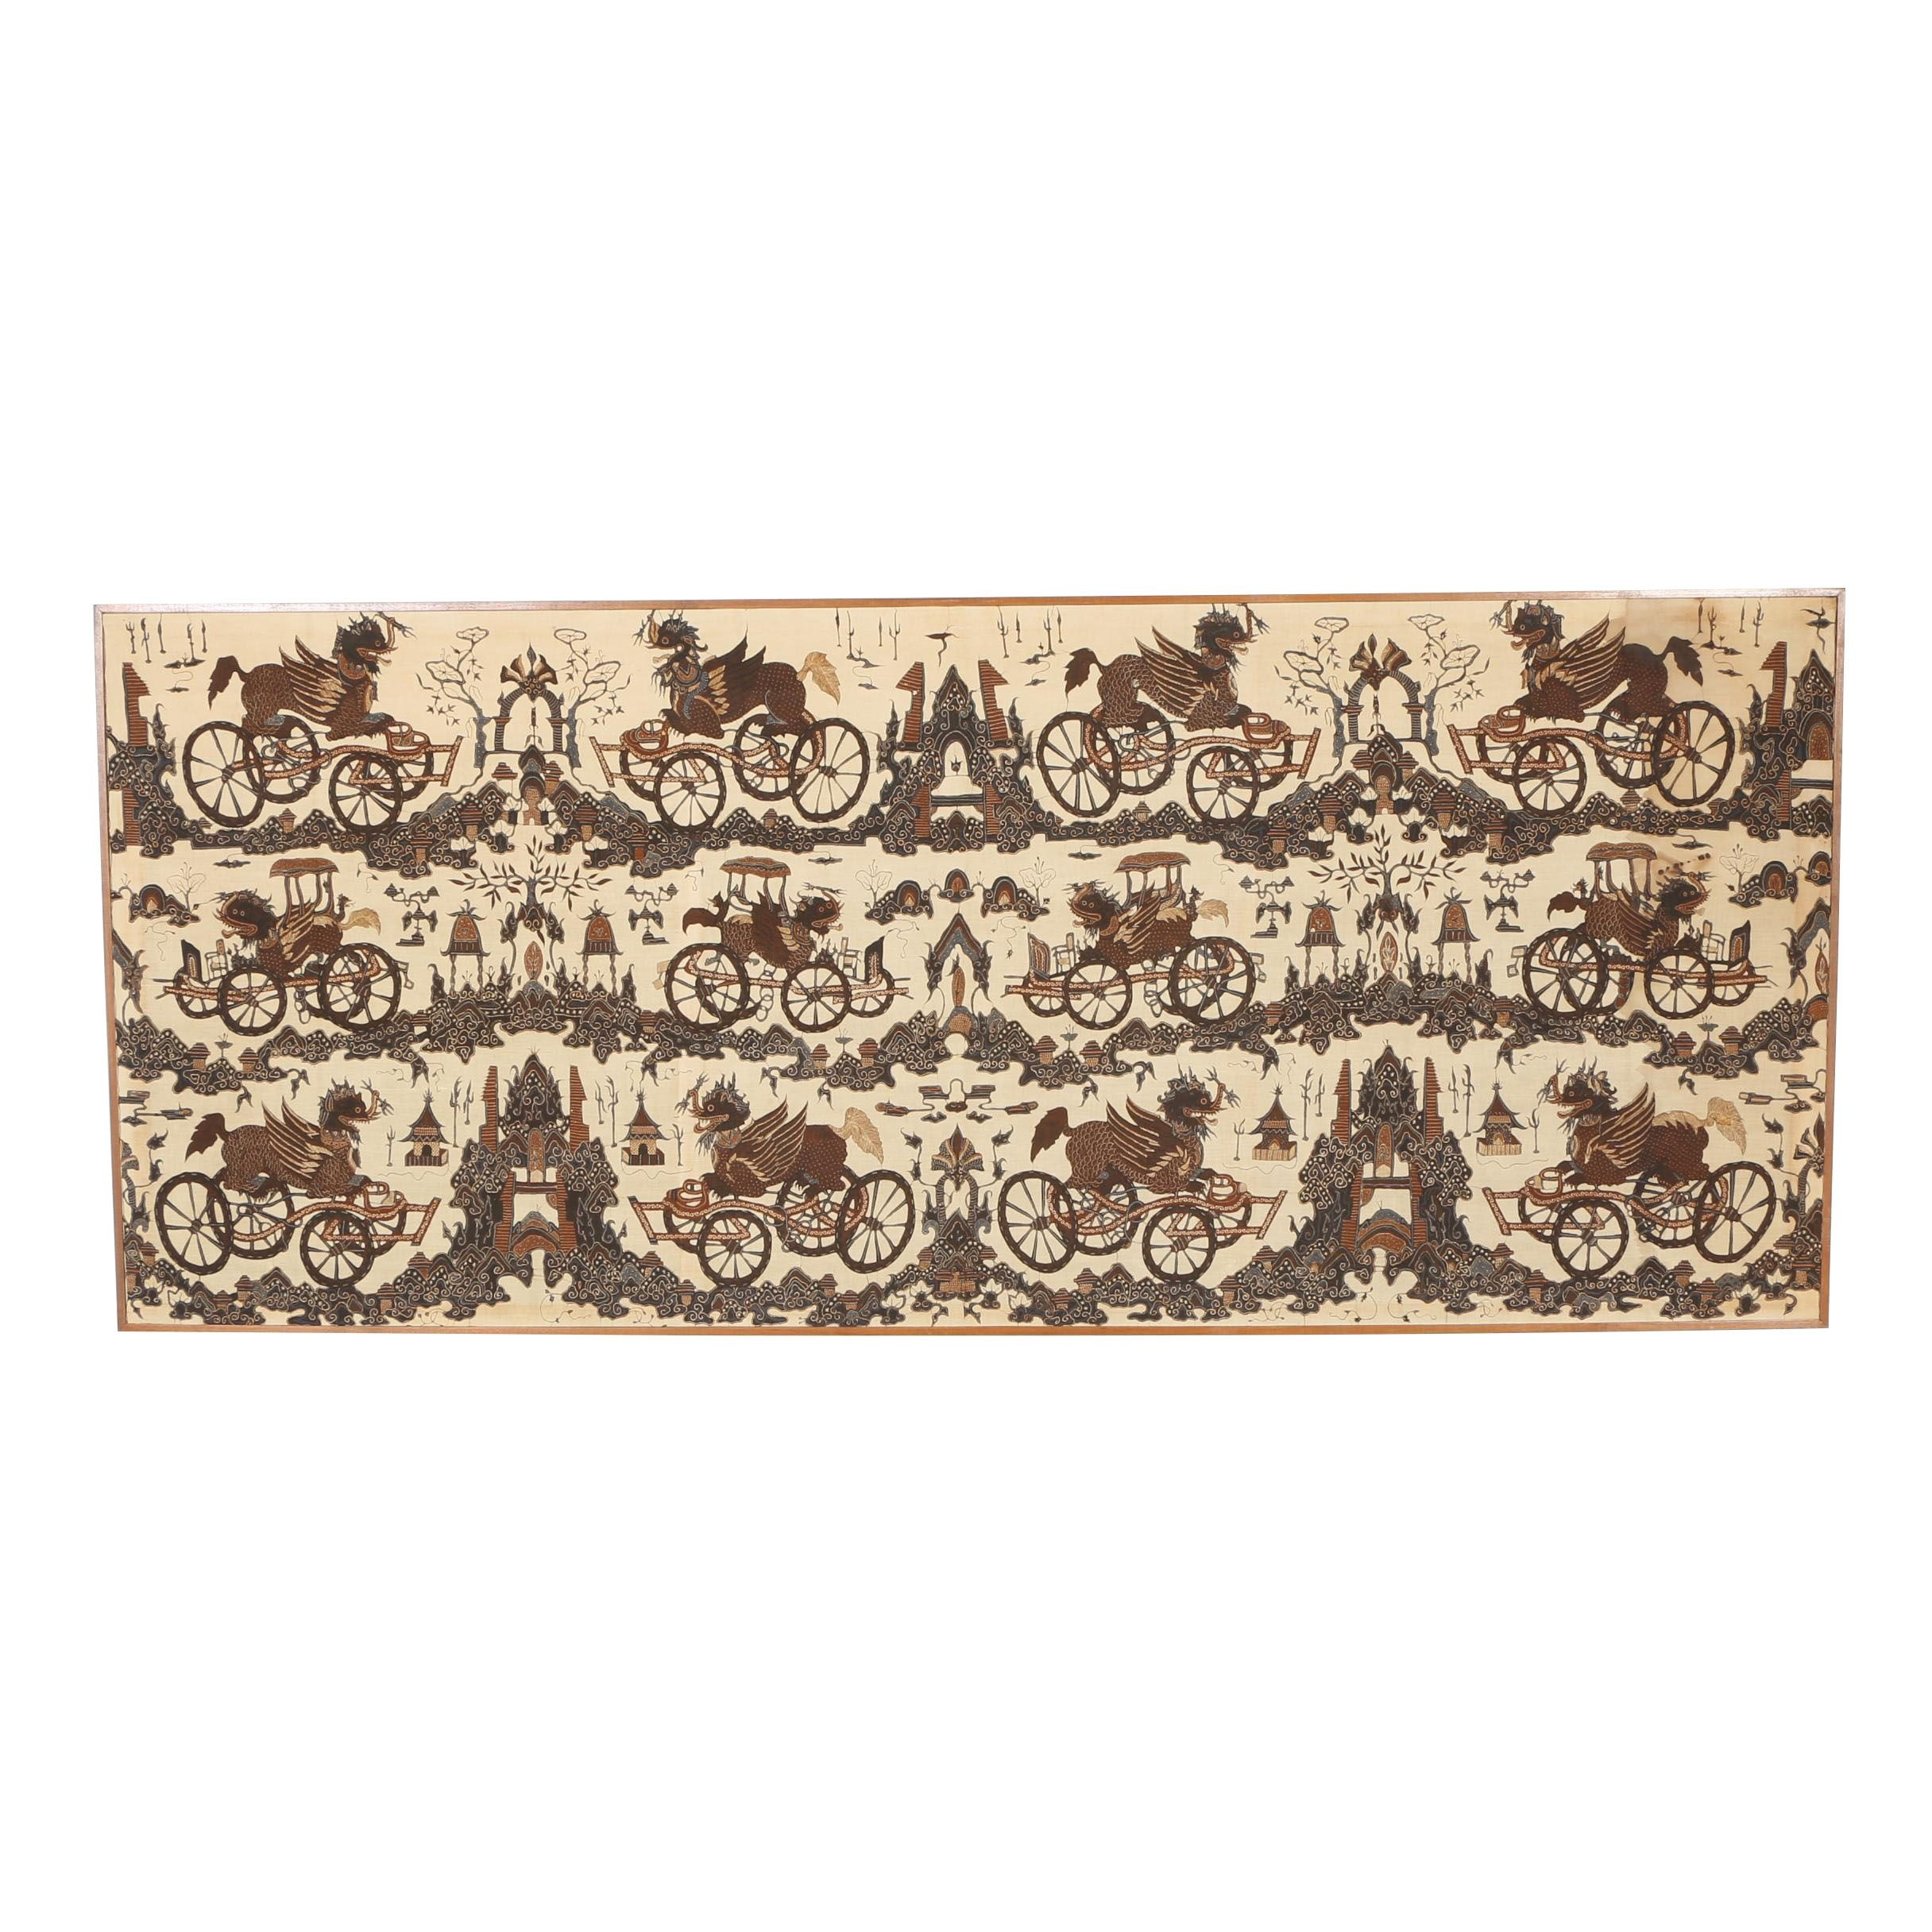 Balinese Style Batik Textile